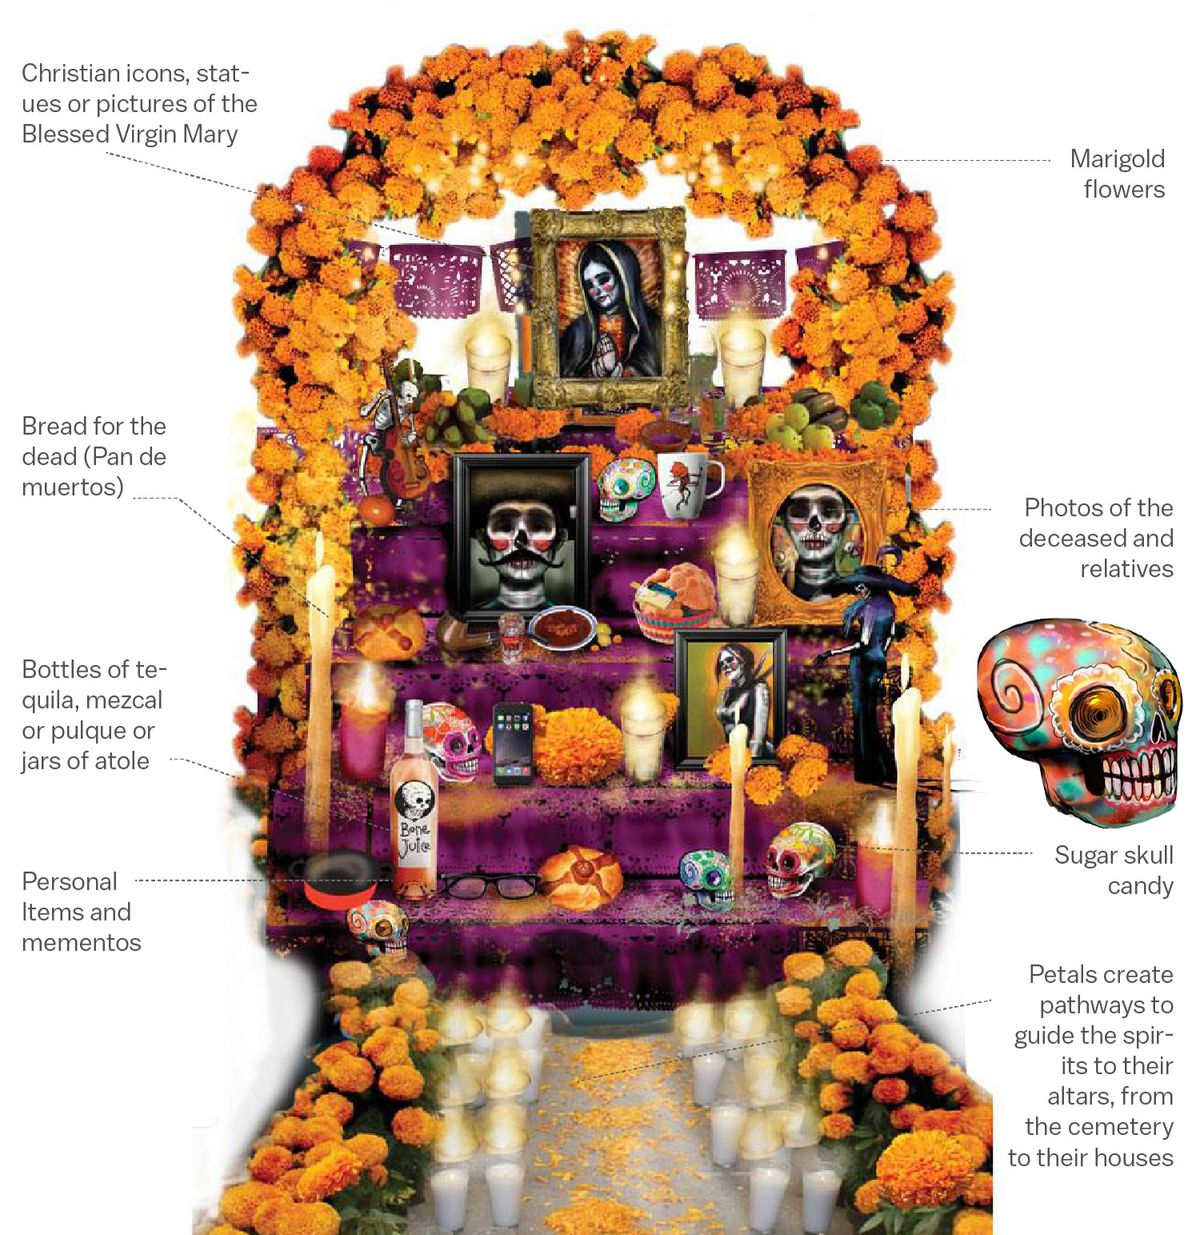 Illustration of an ofrenda, contaning marigolds, bread for the dead, framed photos of dead relatives, bottles of mezcal, and sugar skulls.